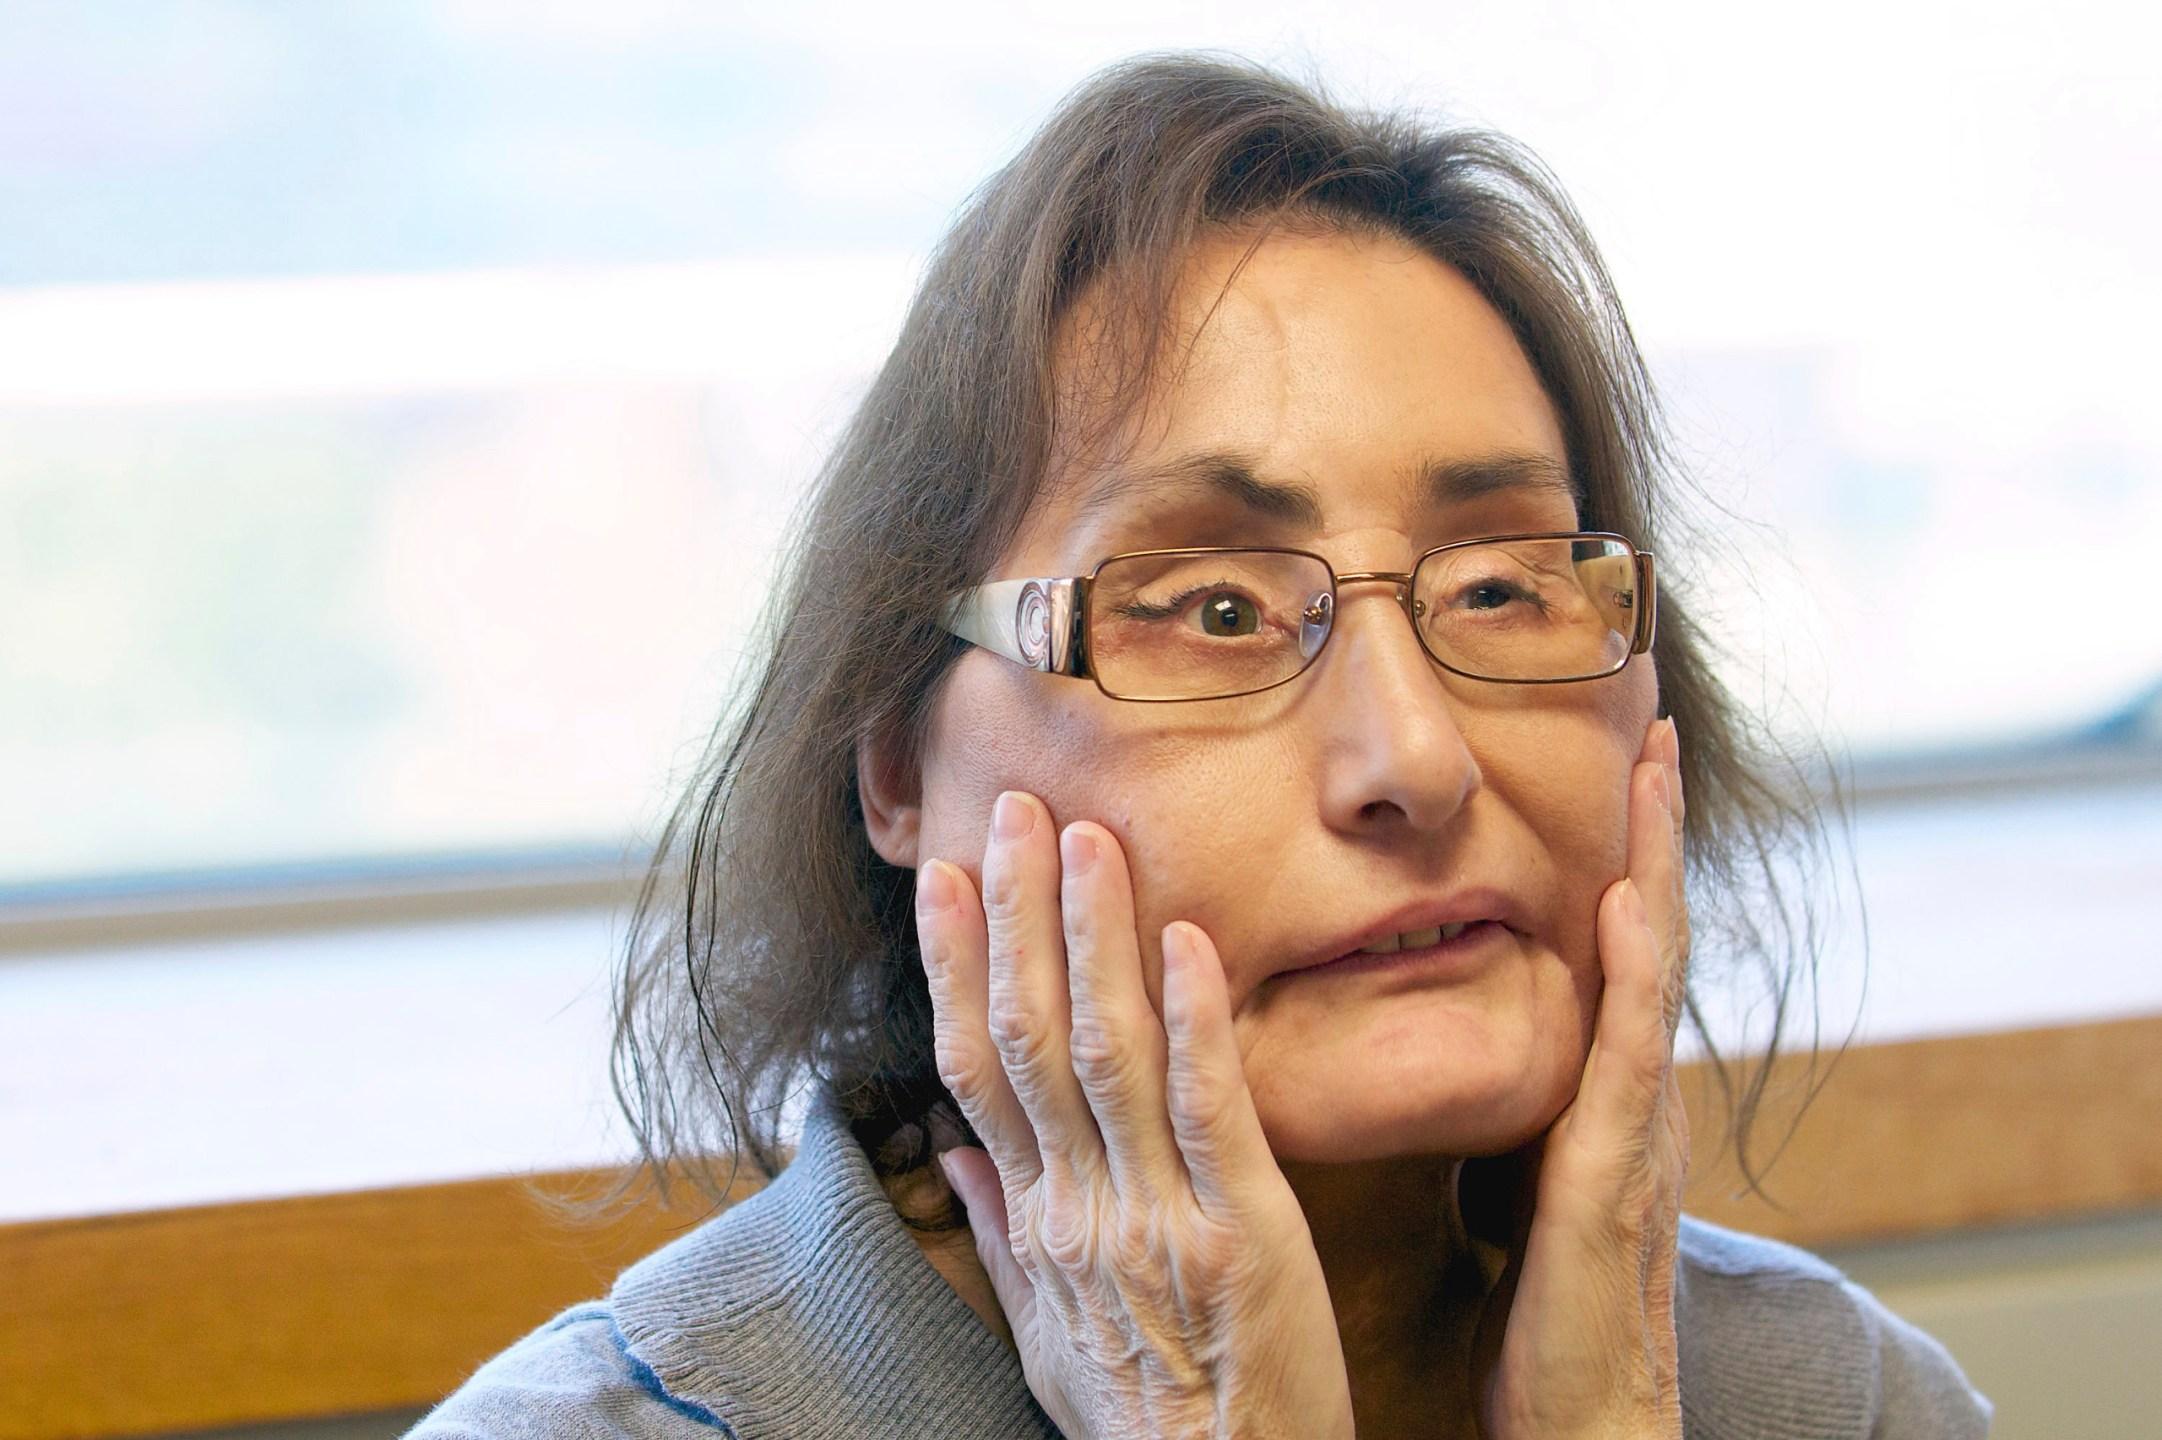 Connie Culp 1st Us Partial Face Transplant Recipient